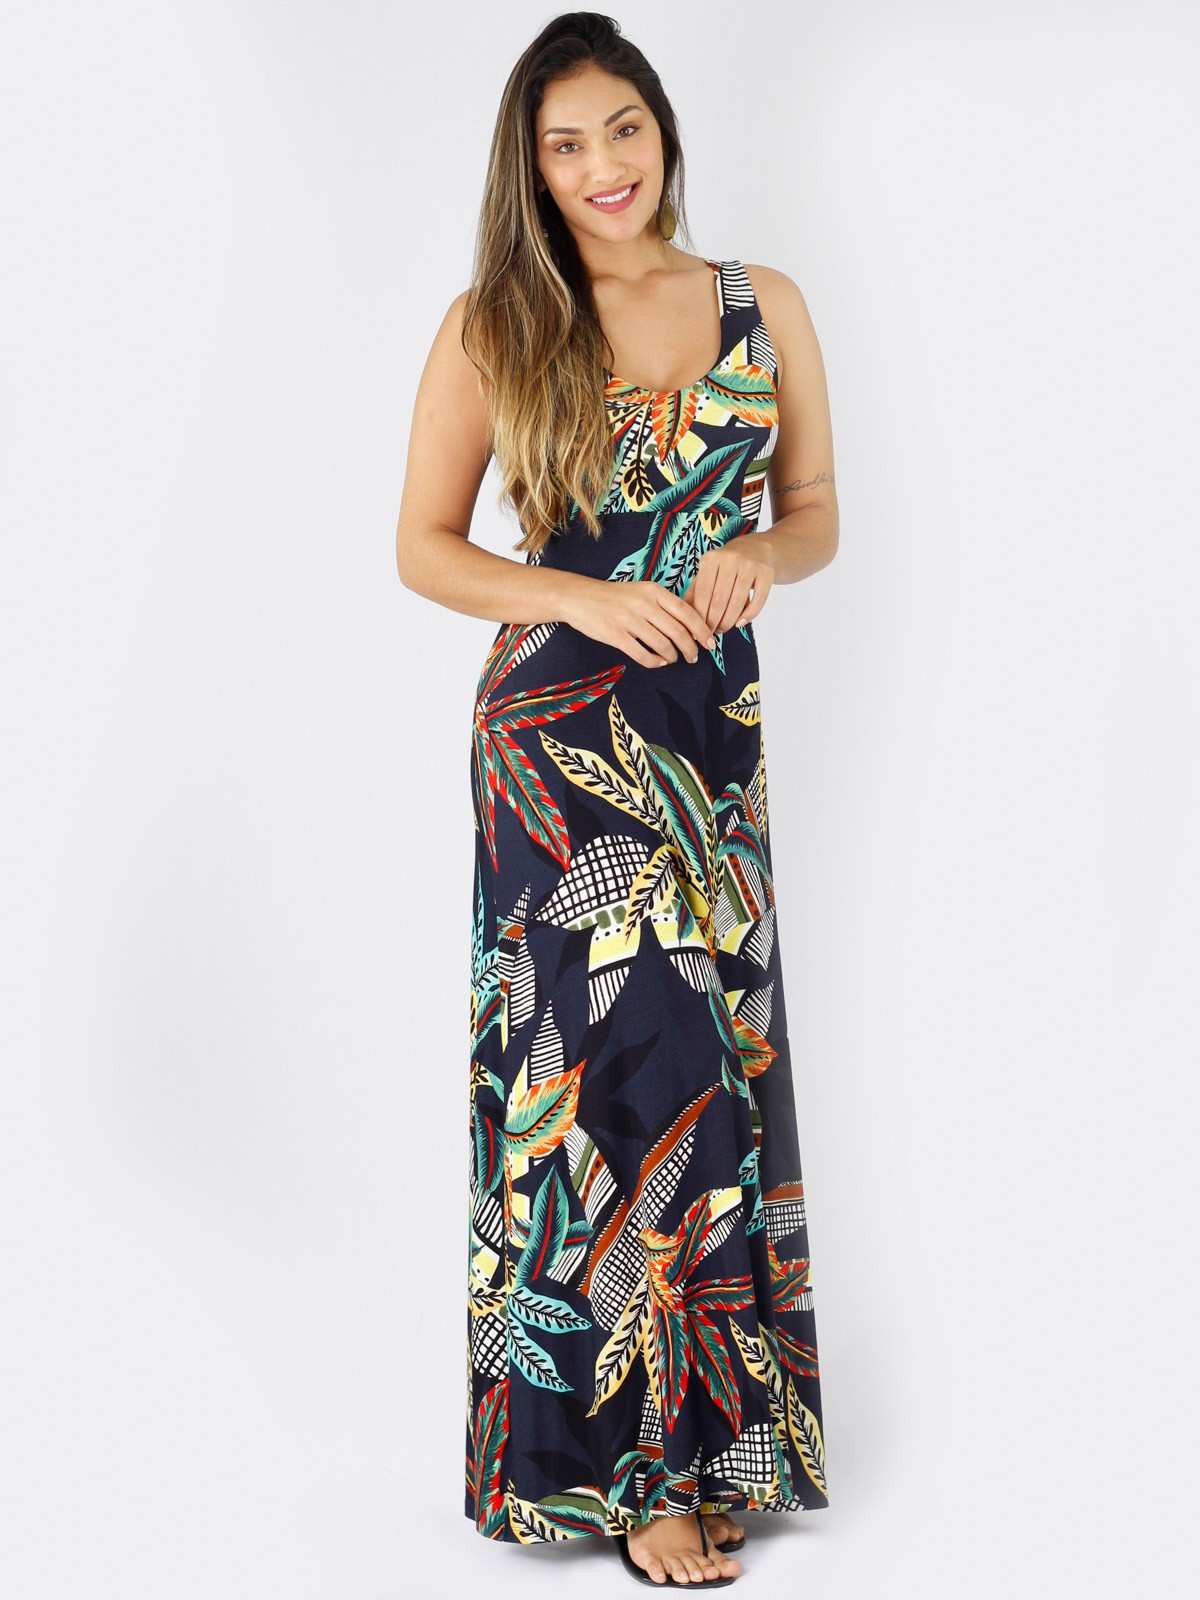 Vestido Longo de Malha Estampada